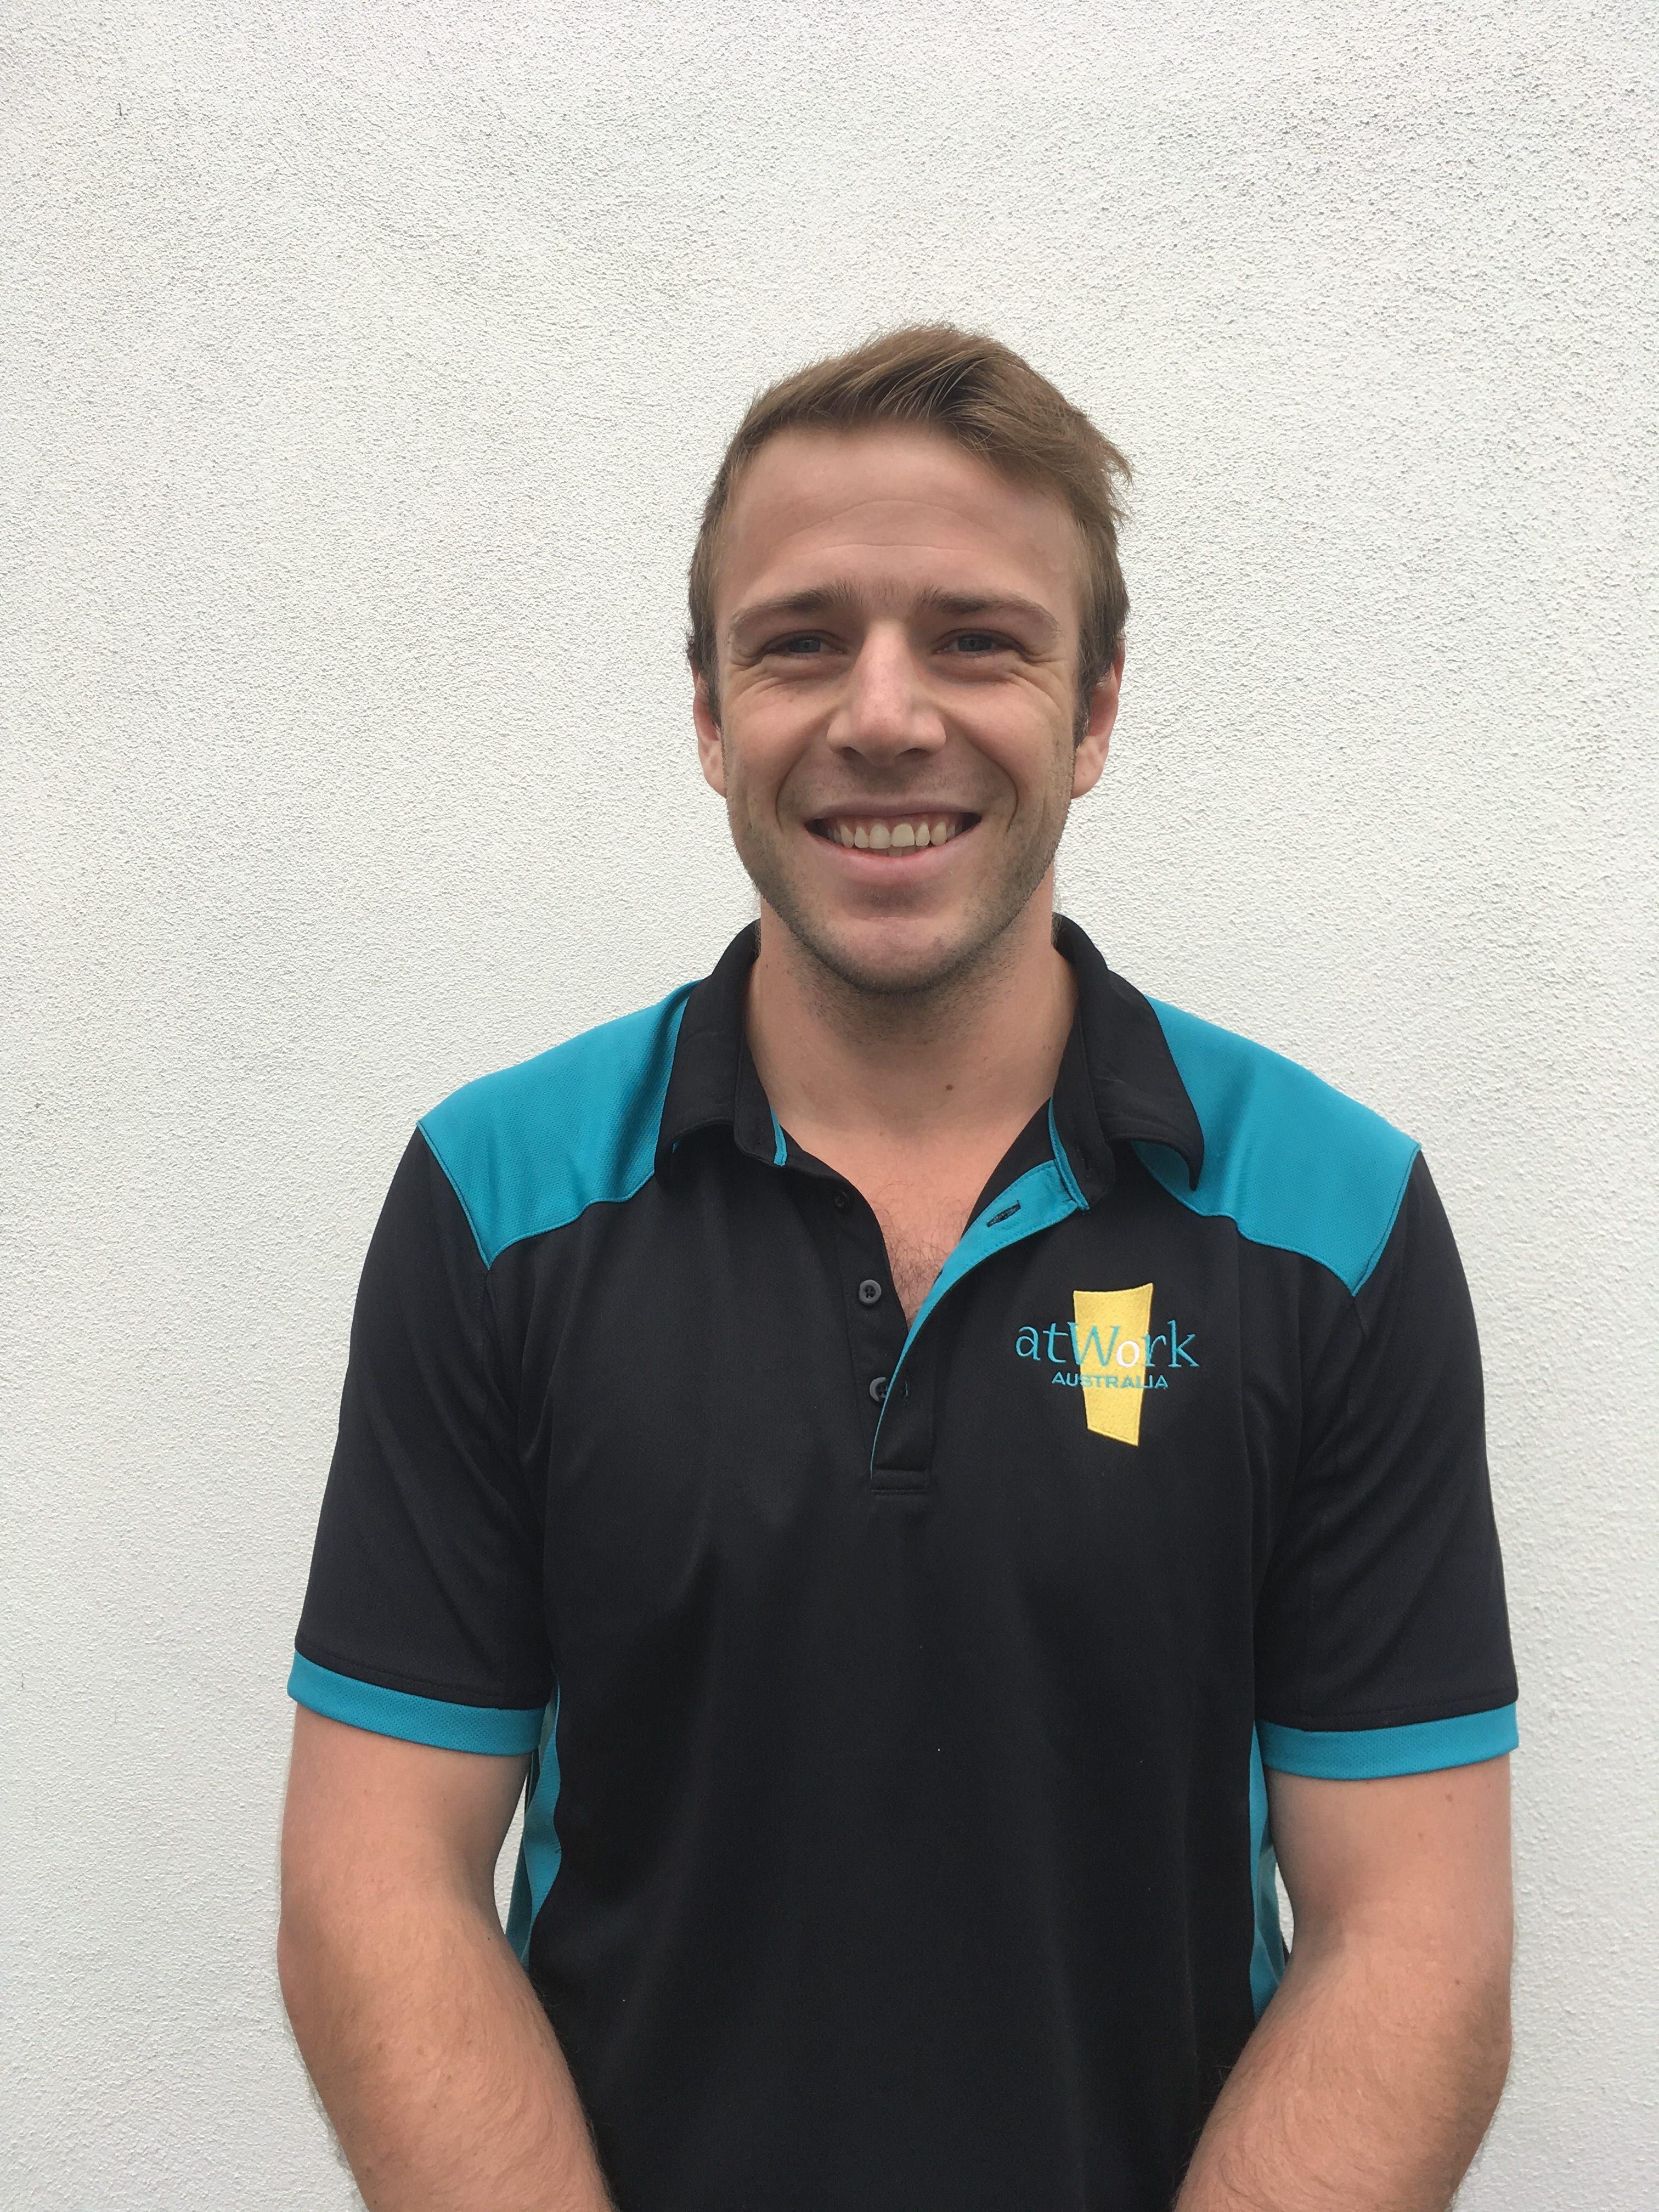 Meet Shaun Pianta, atWork Australia's DES Ambassador